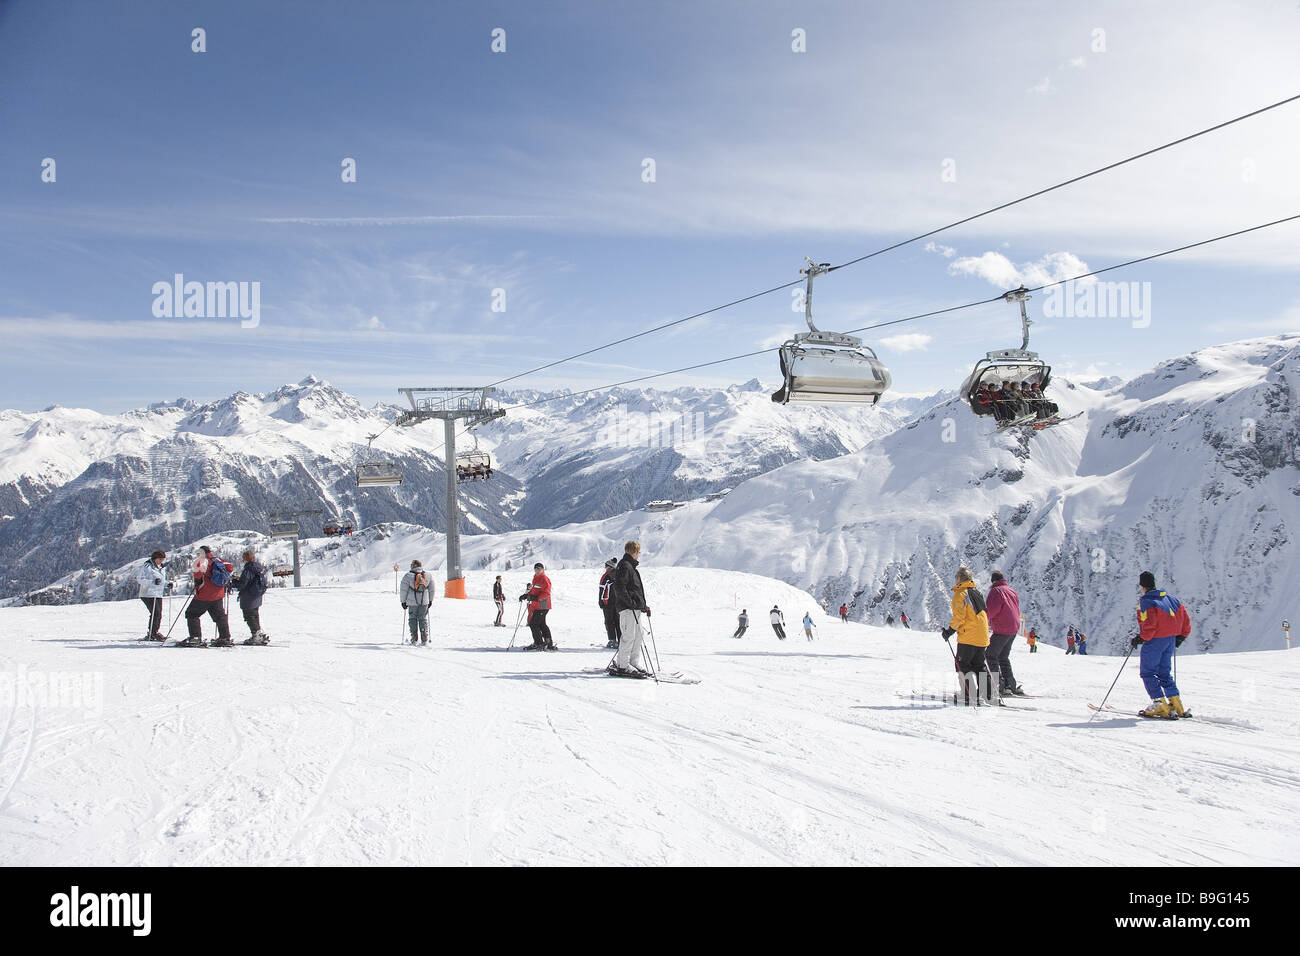 buy ski lift chair tiffany chairs for sale austria vorarlberg montafon area skiers